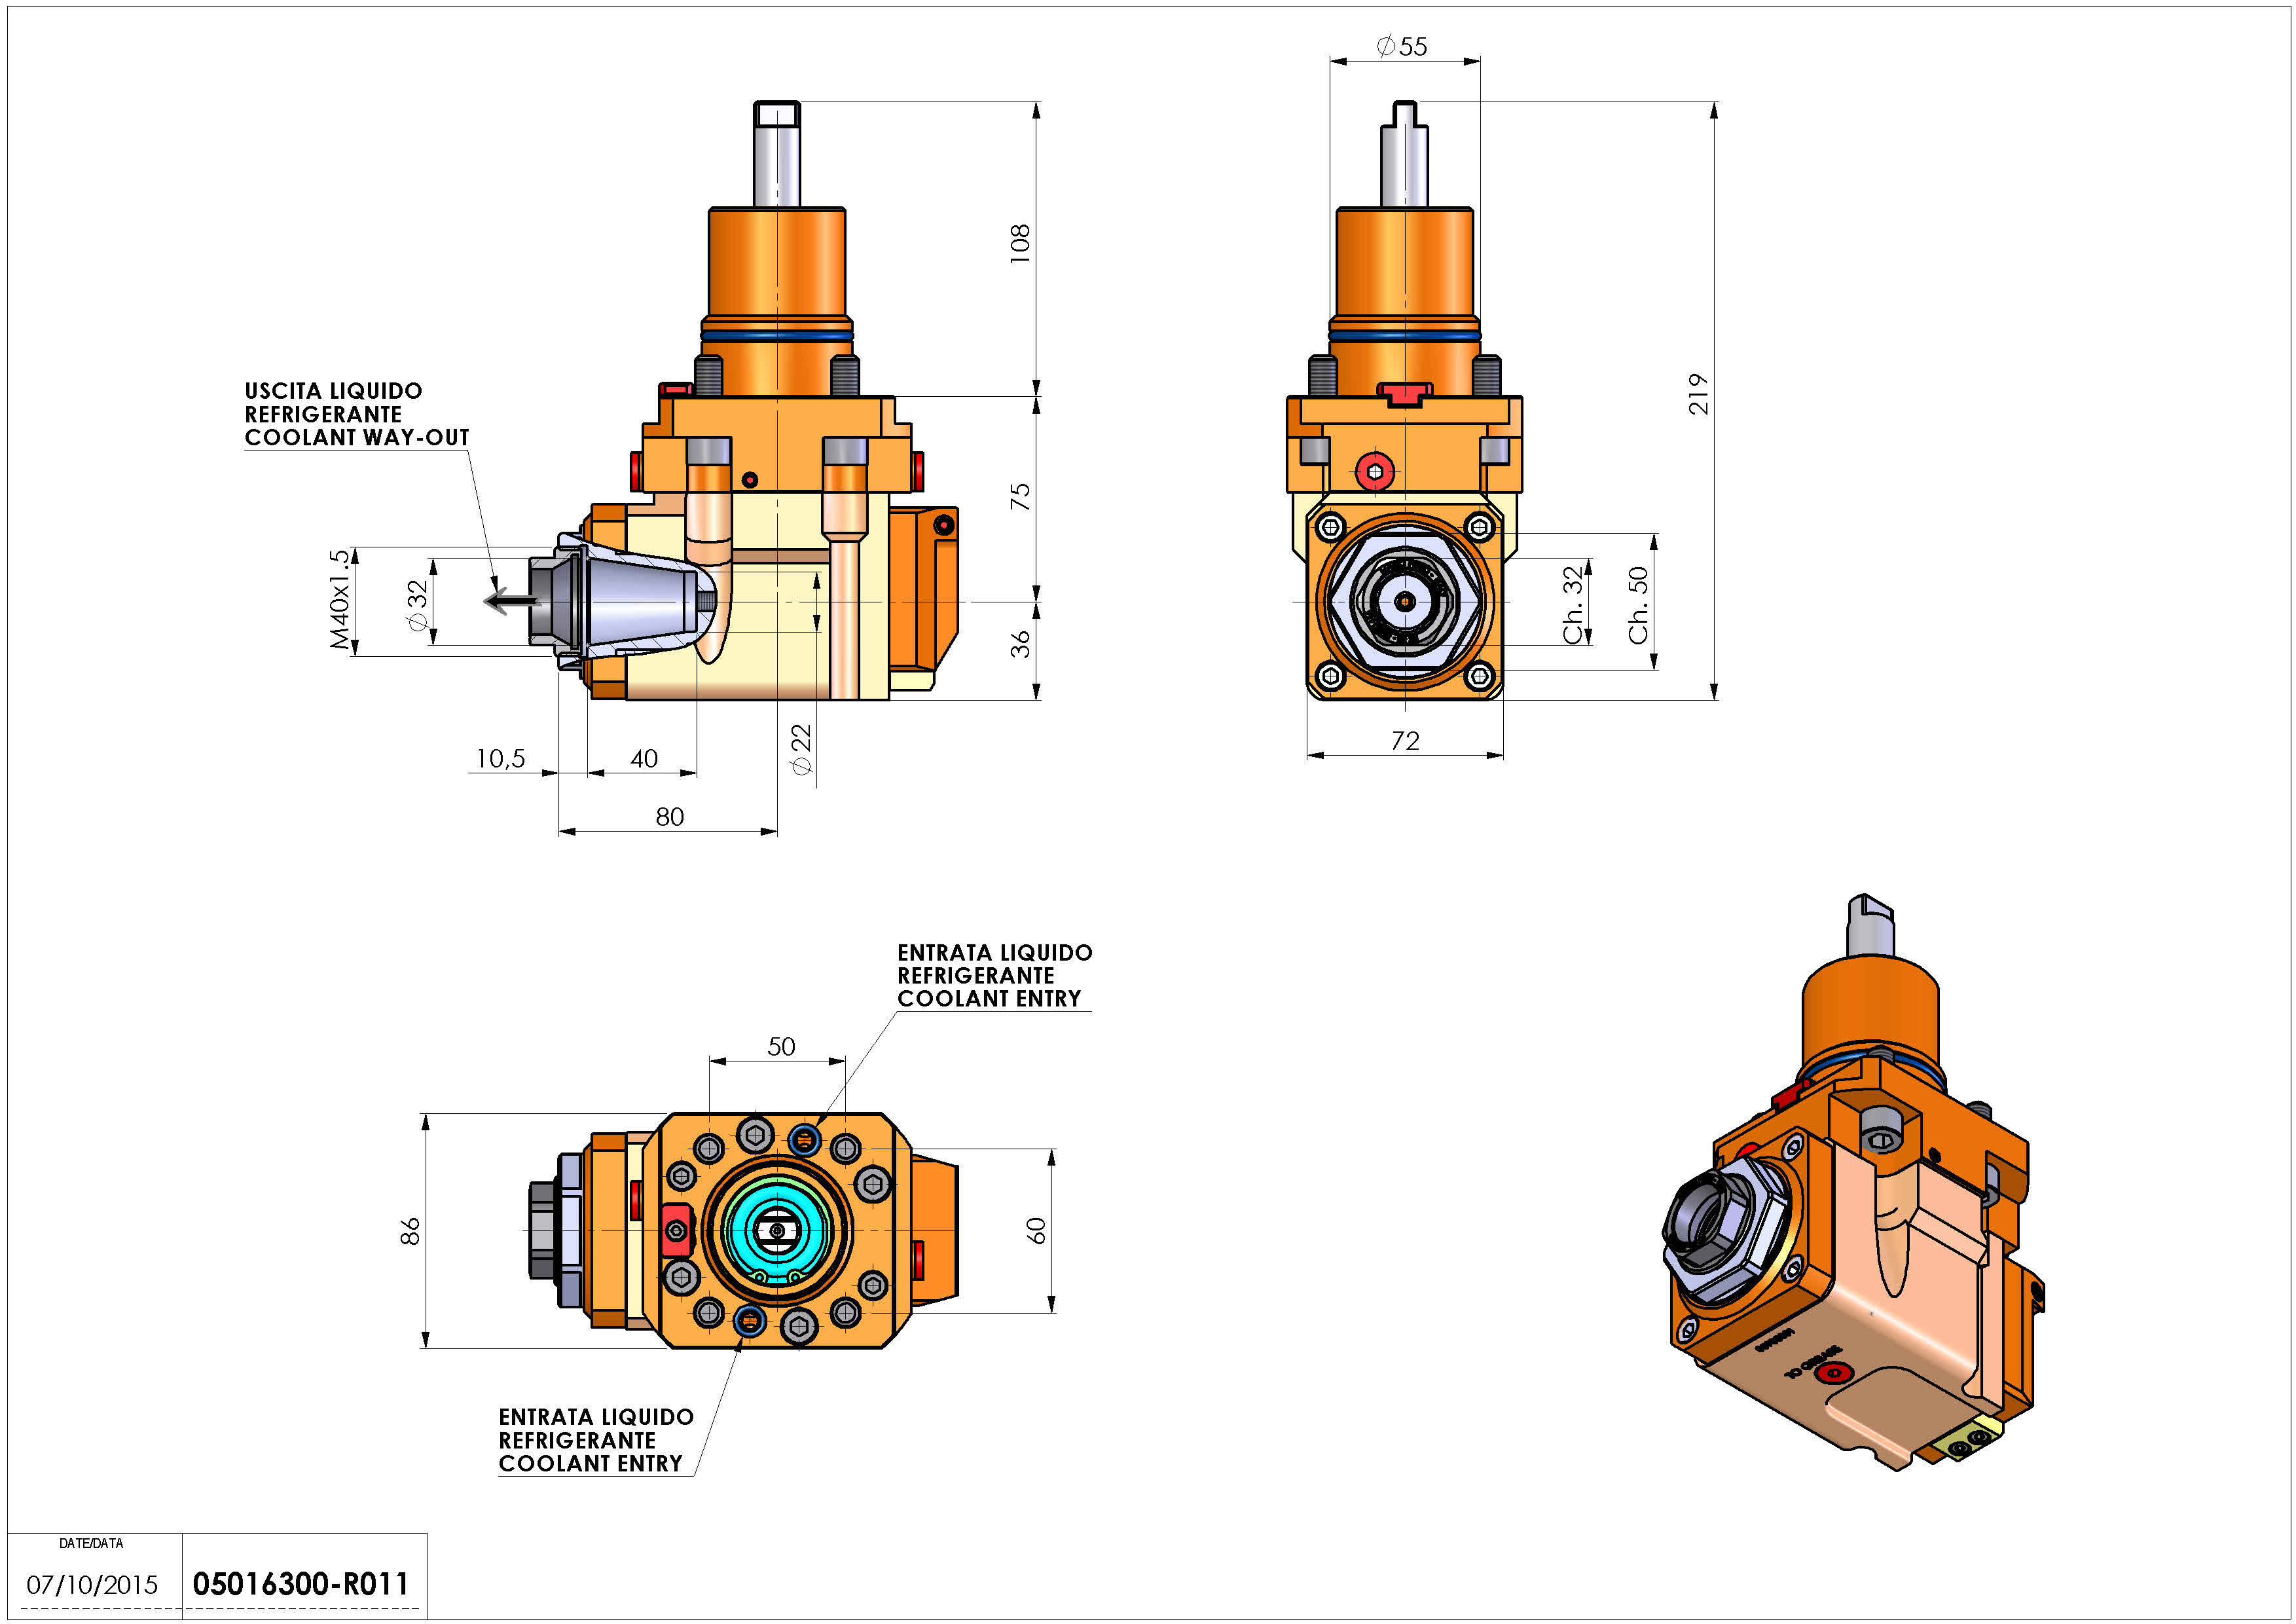 Technical image - LT-A D55 ER32F H75 RFH-PR NK.